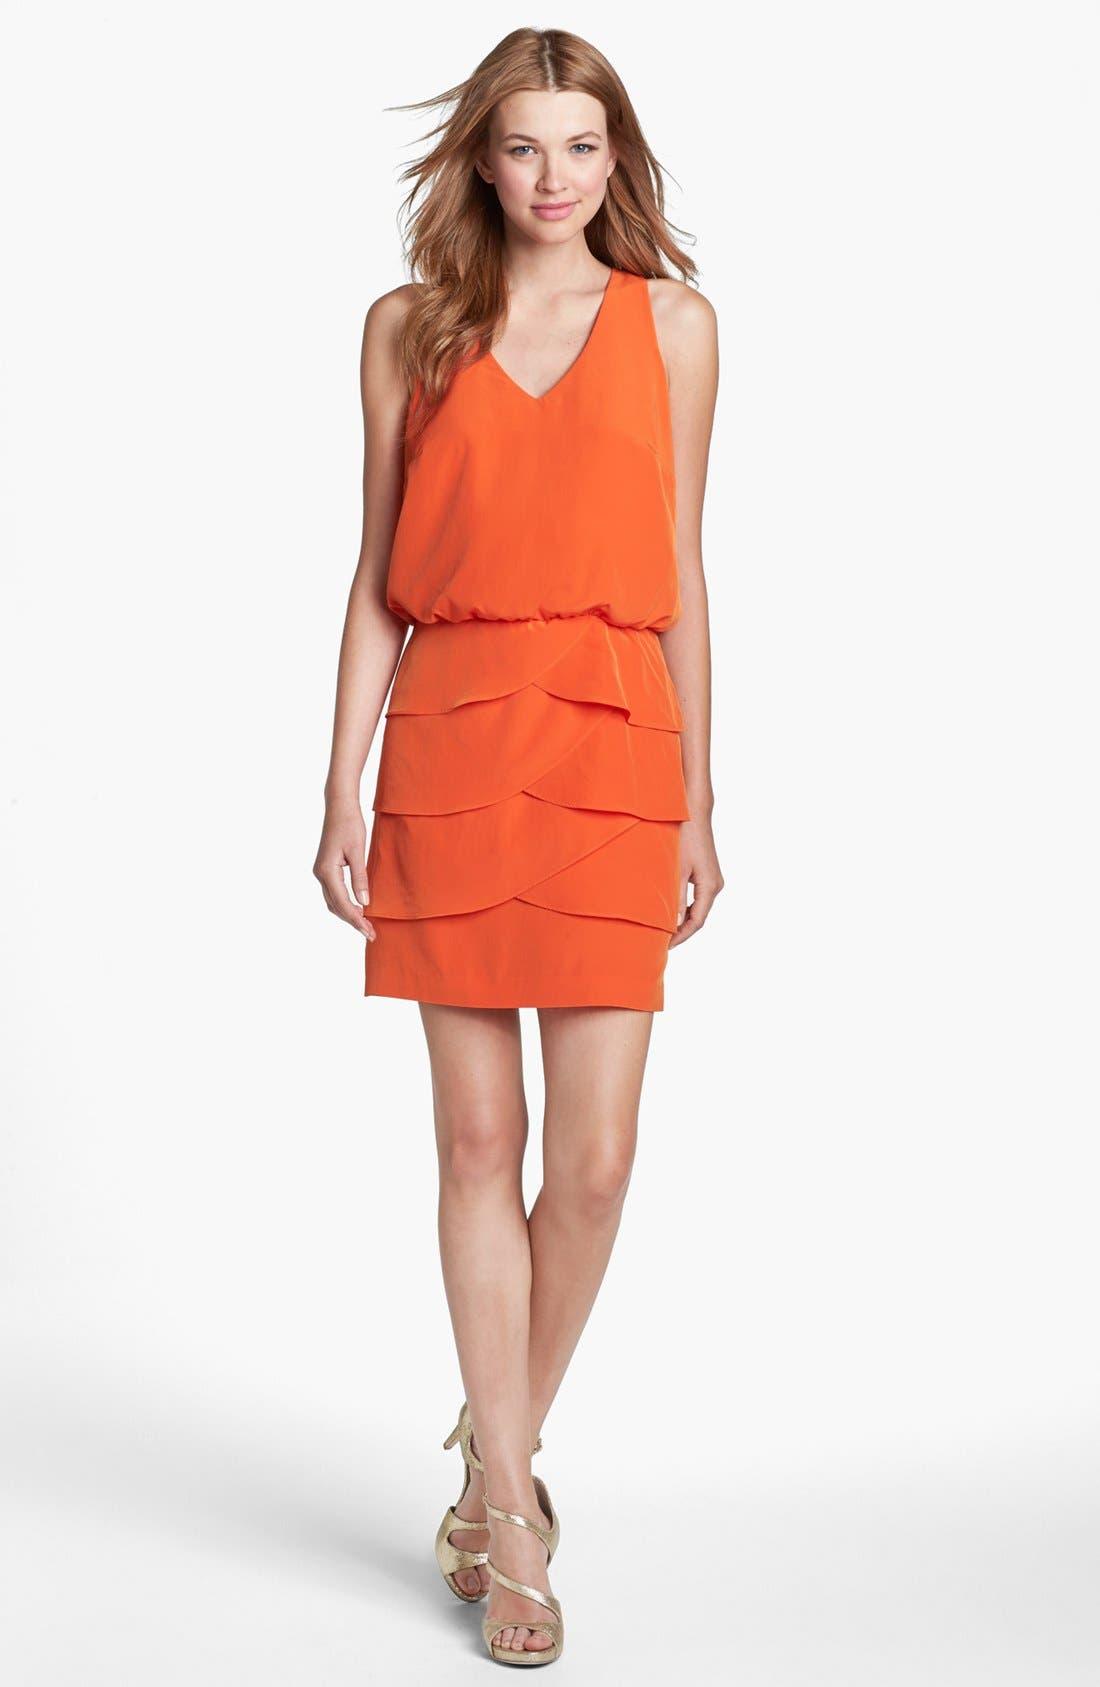 Main Image - Laundry by Shelli Segal Tiered Skirt Racerback Blouson Dress